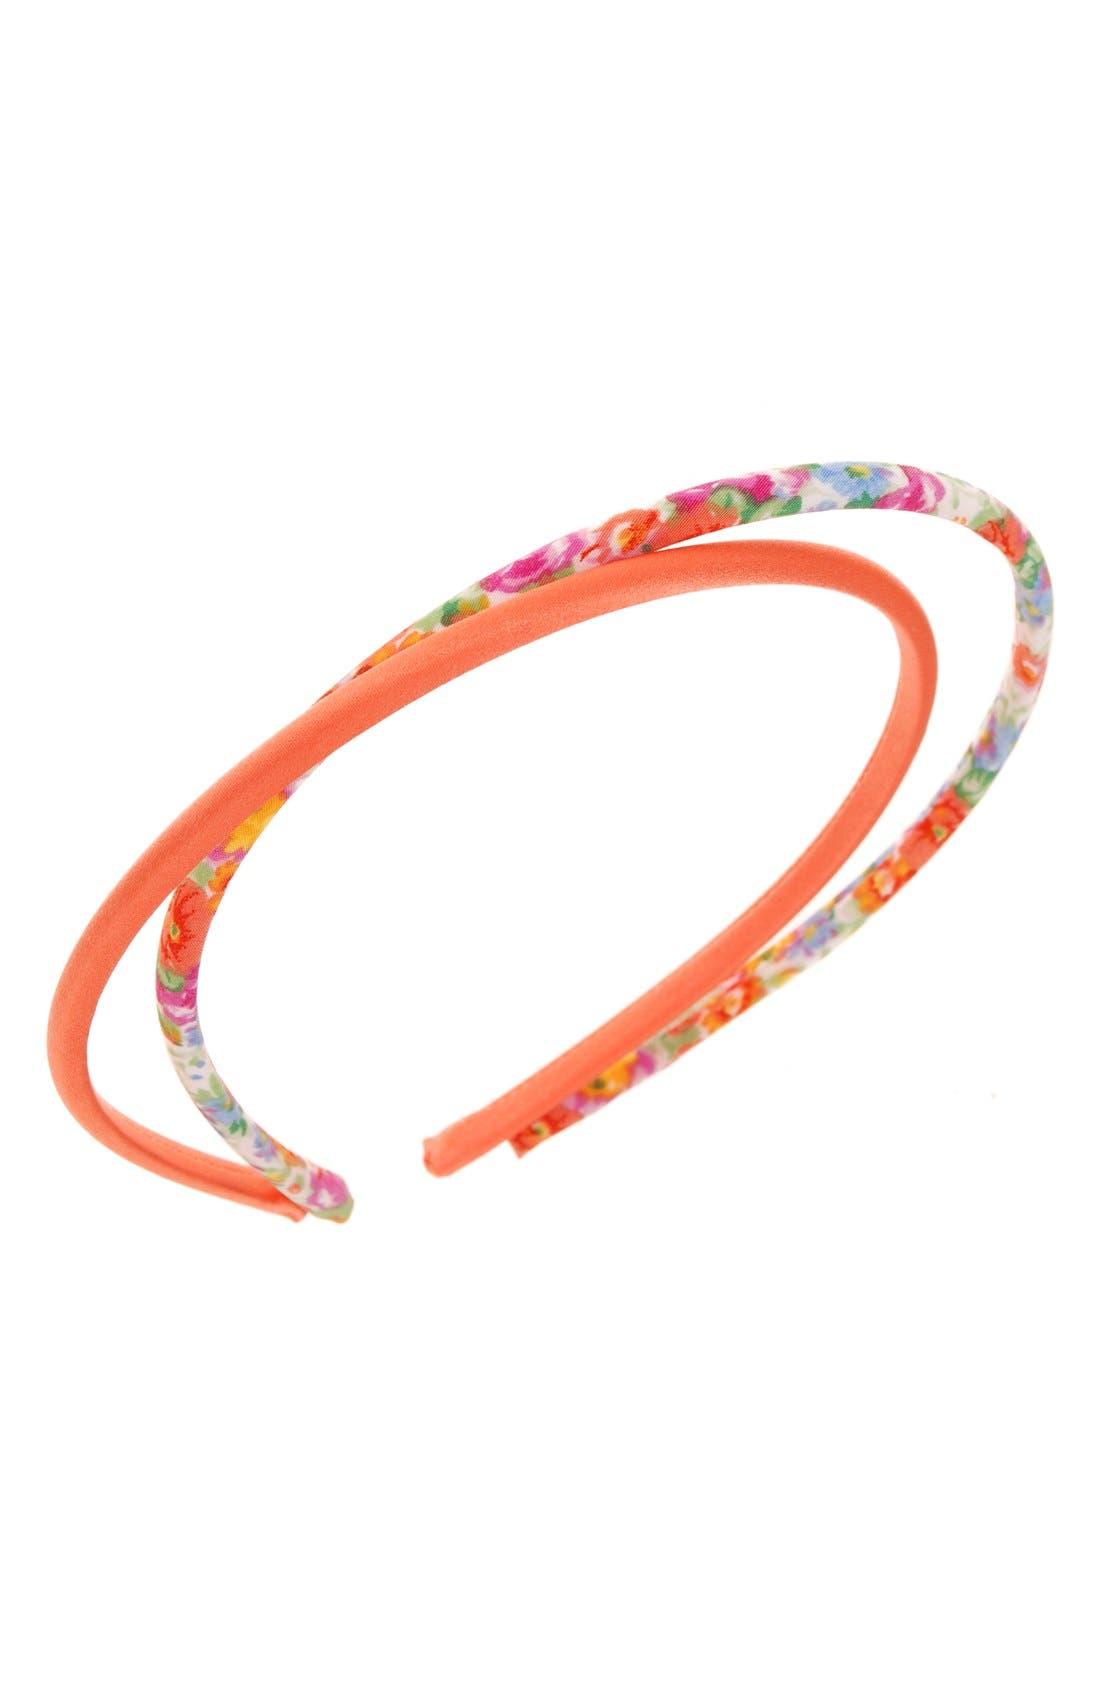 L. Erickson Skinny Silk Headbands (2-Pack) (Girls)